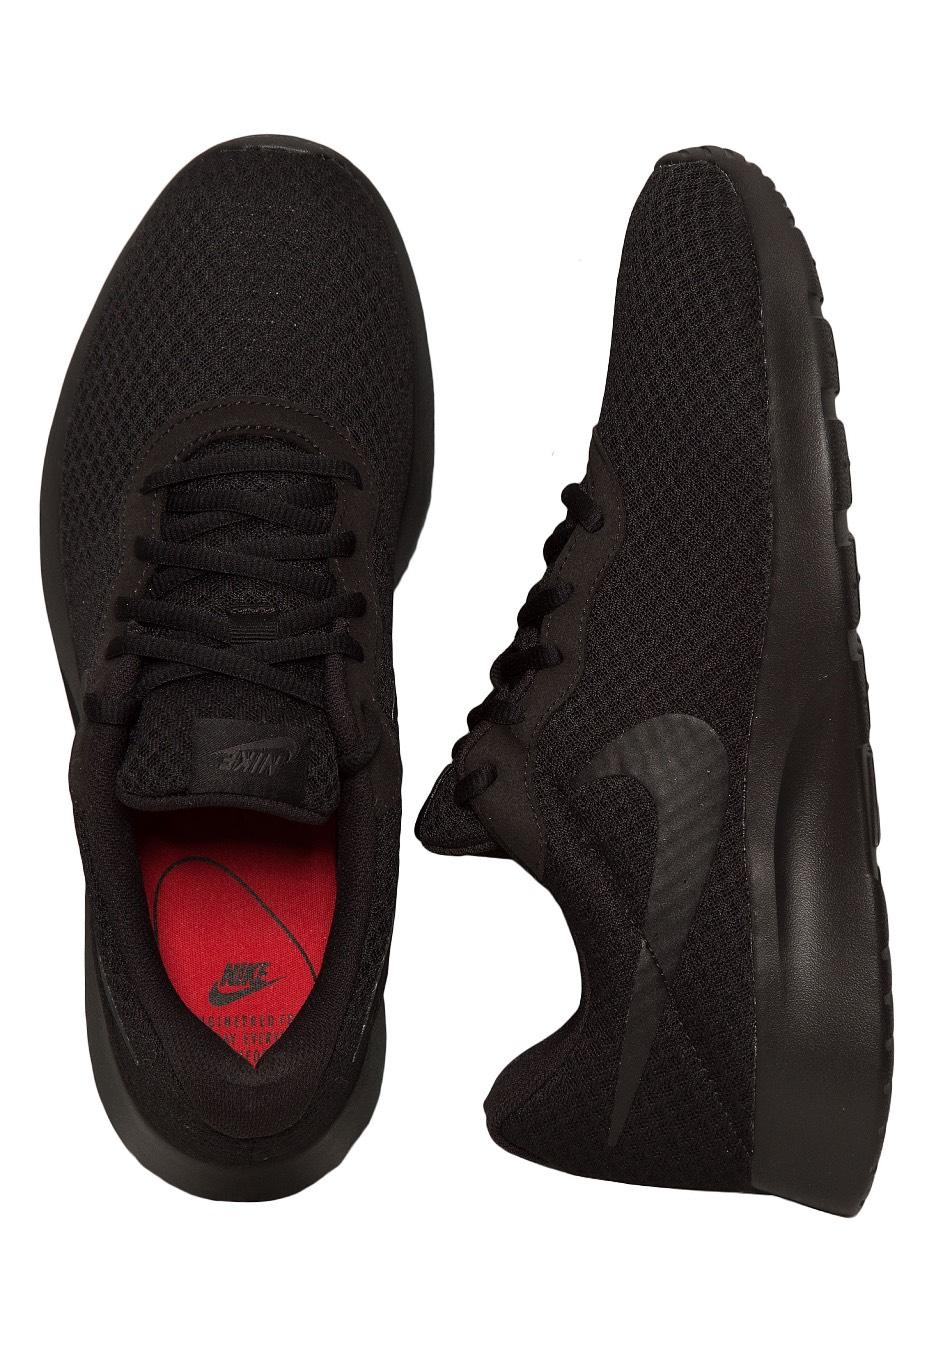 Obediente Jardines Masculinidad  Nike - Tanjun Black/Black/Anthracite - Shoes - Impericon.com Worldwide